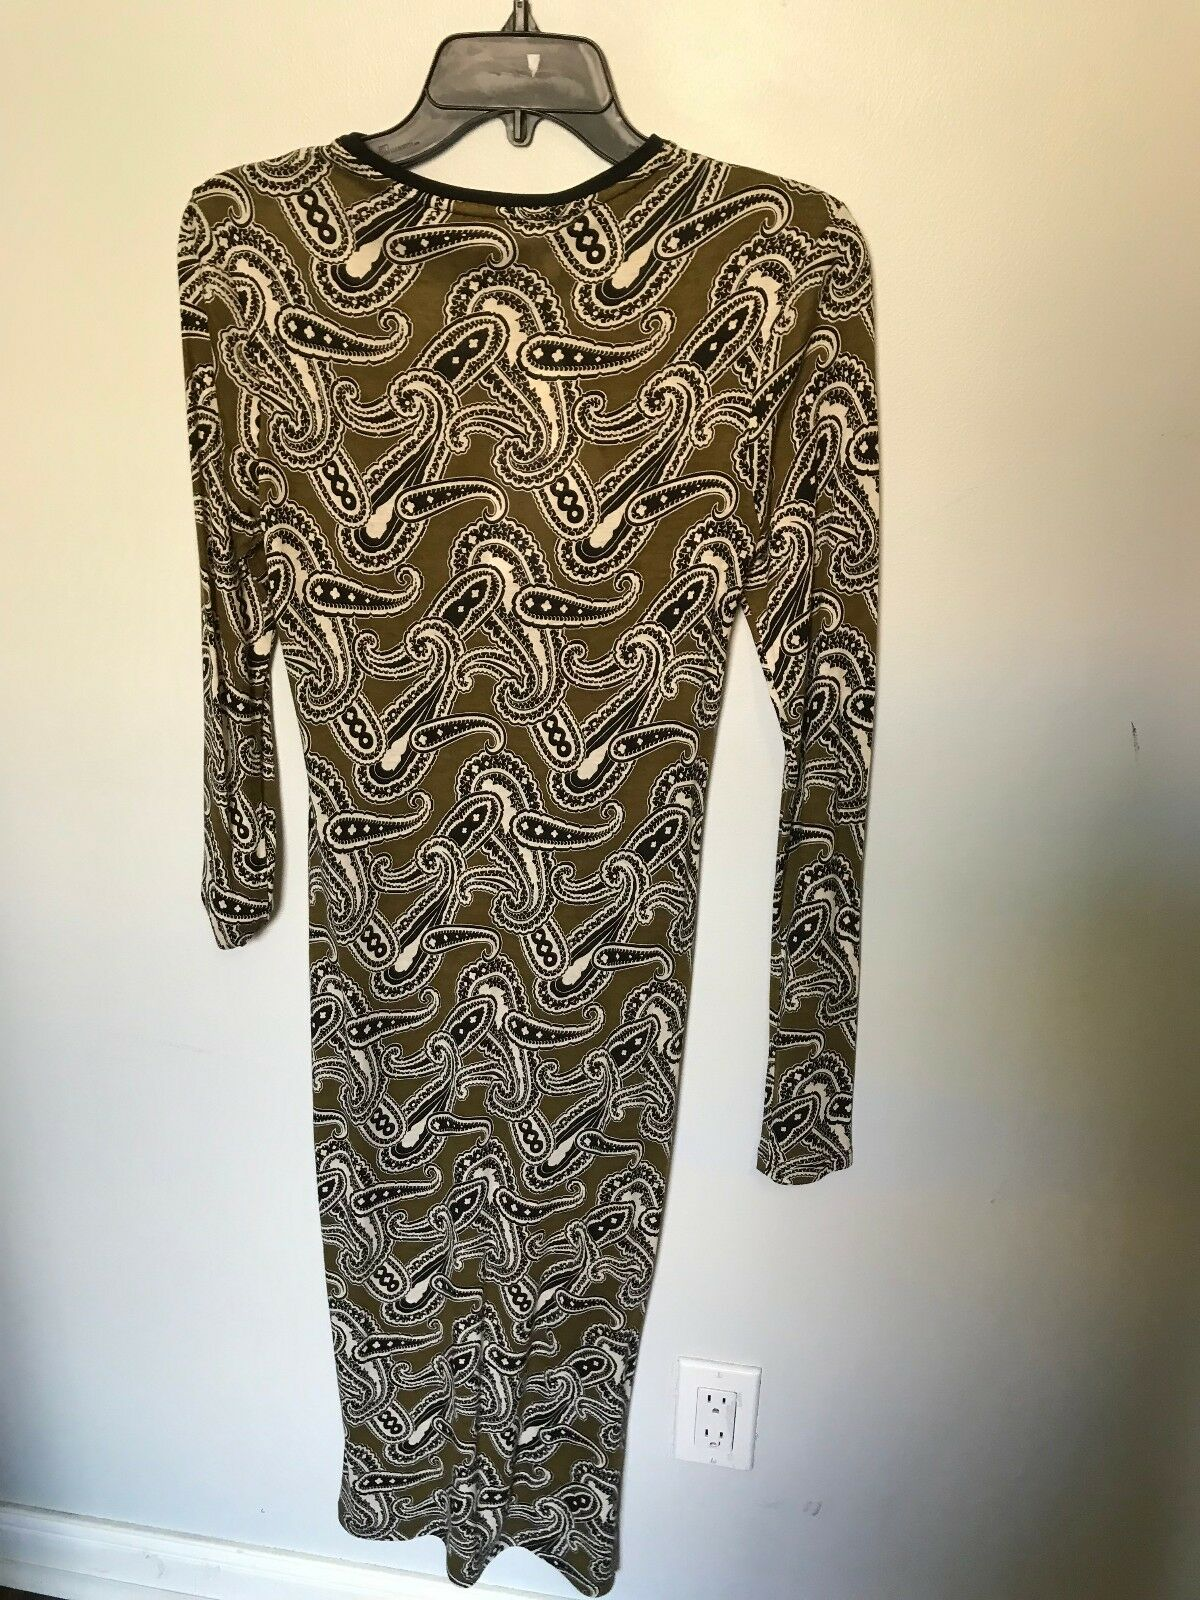 NWT NWT NWT Derek Lam Paisley Knit Dress - Size S 7f91c6